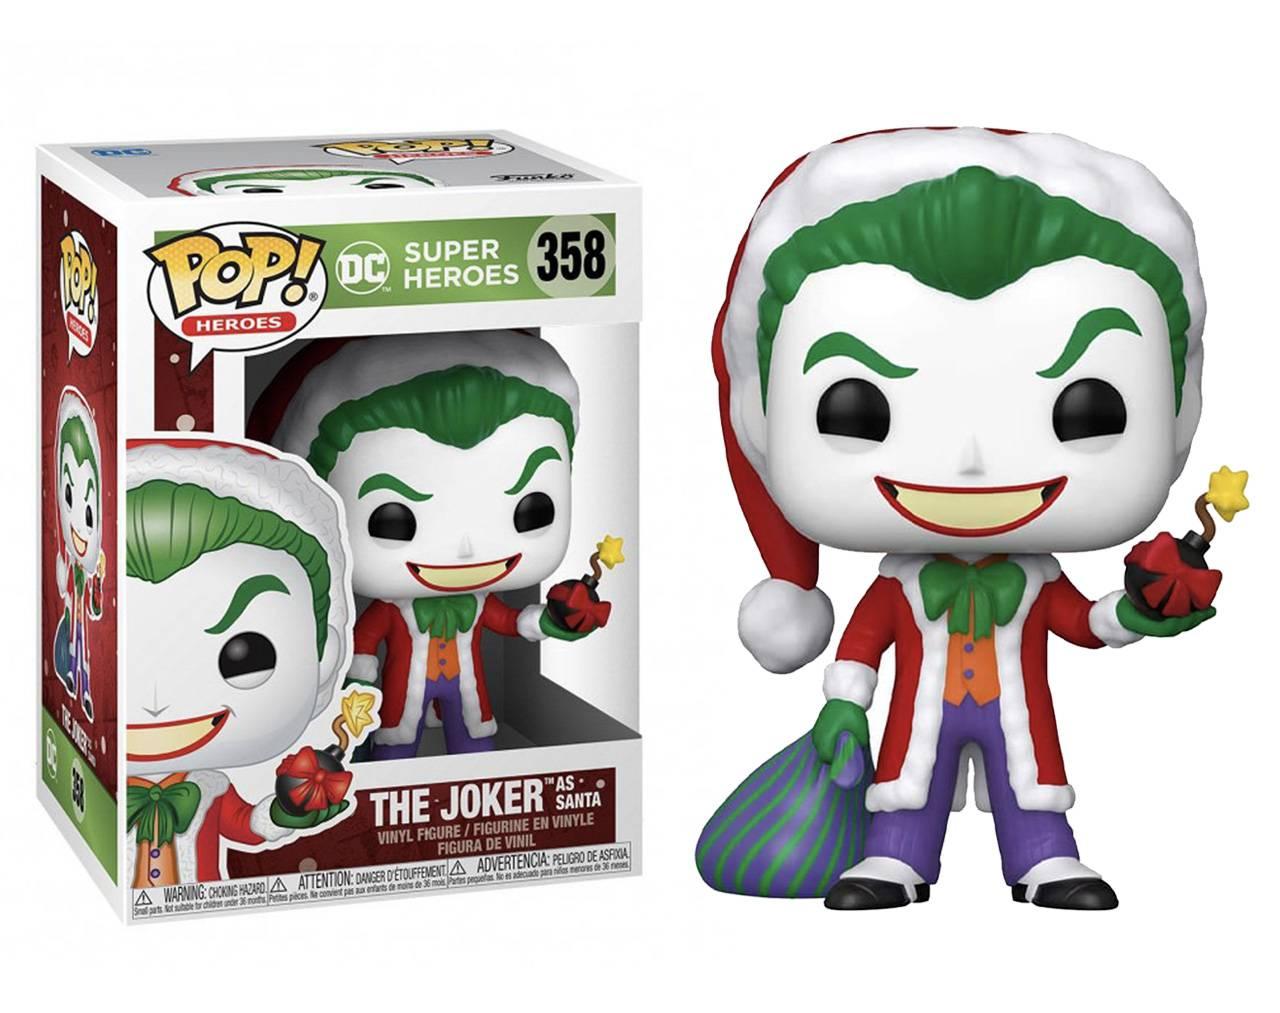 The Joker as Santa Pop! Vinyl